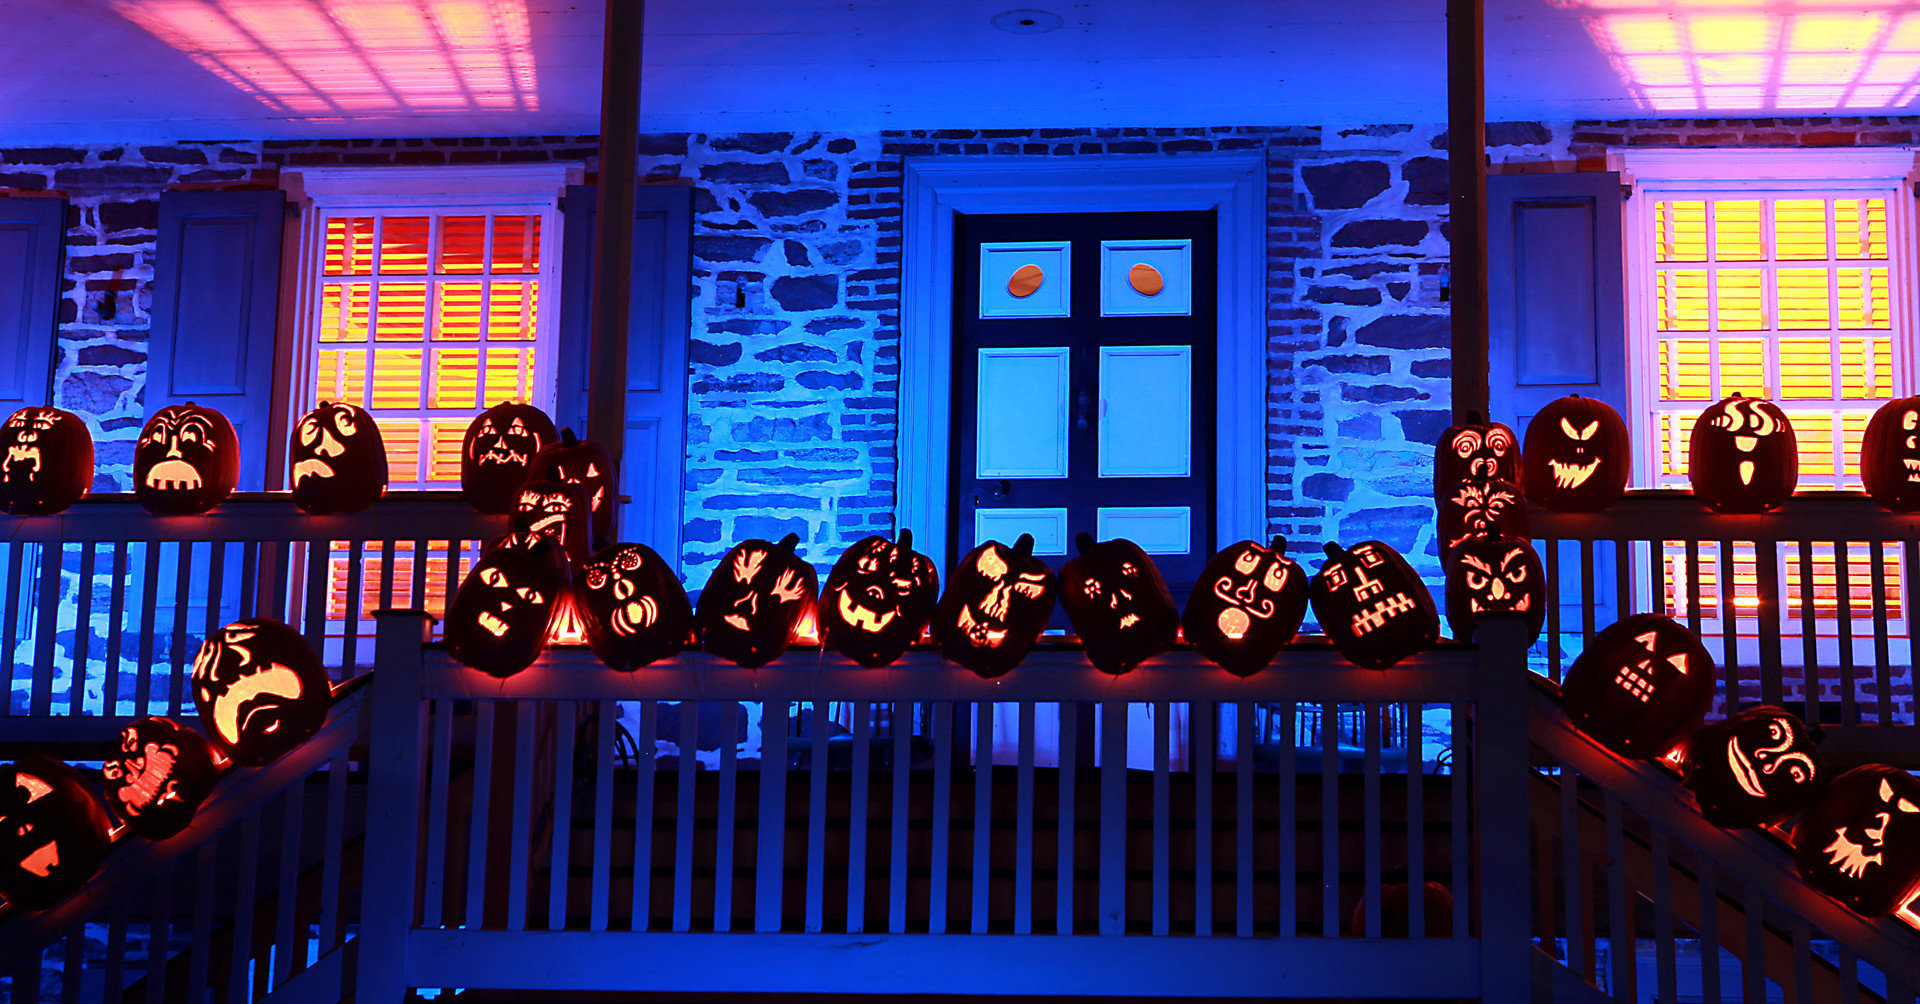 activities art festive halloween lights night pumpkins Trip Ideas stage musical theatre audience auditorium window